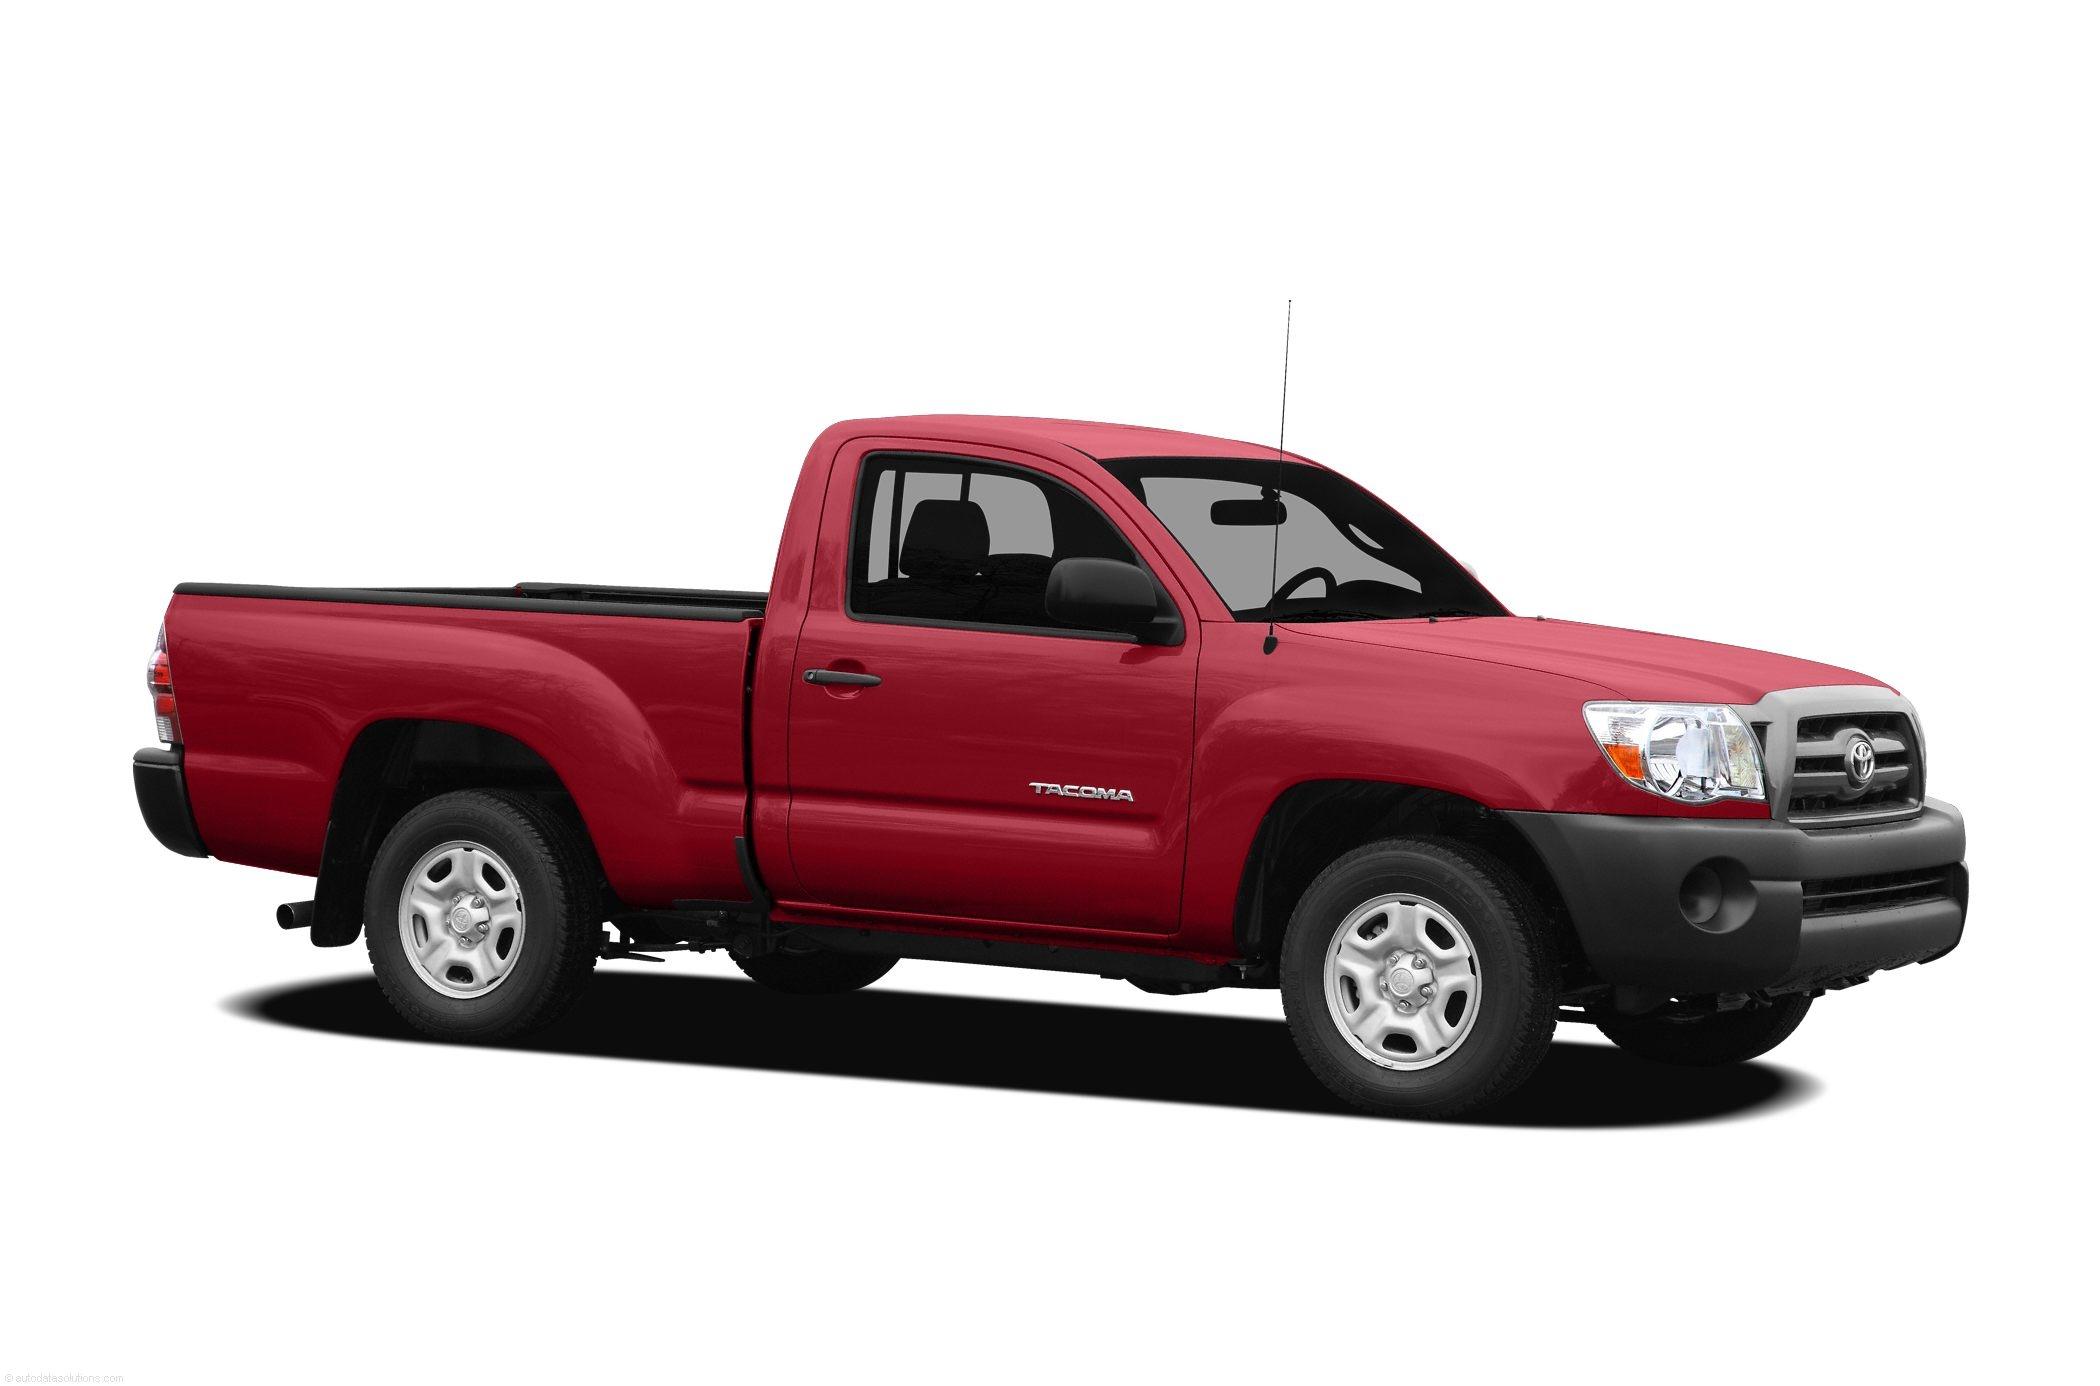 tacoma invoice price toyota tacoma invoice price autos news information 2100 X 1386